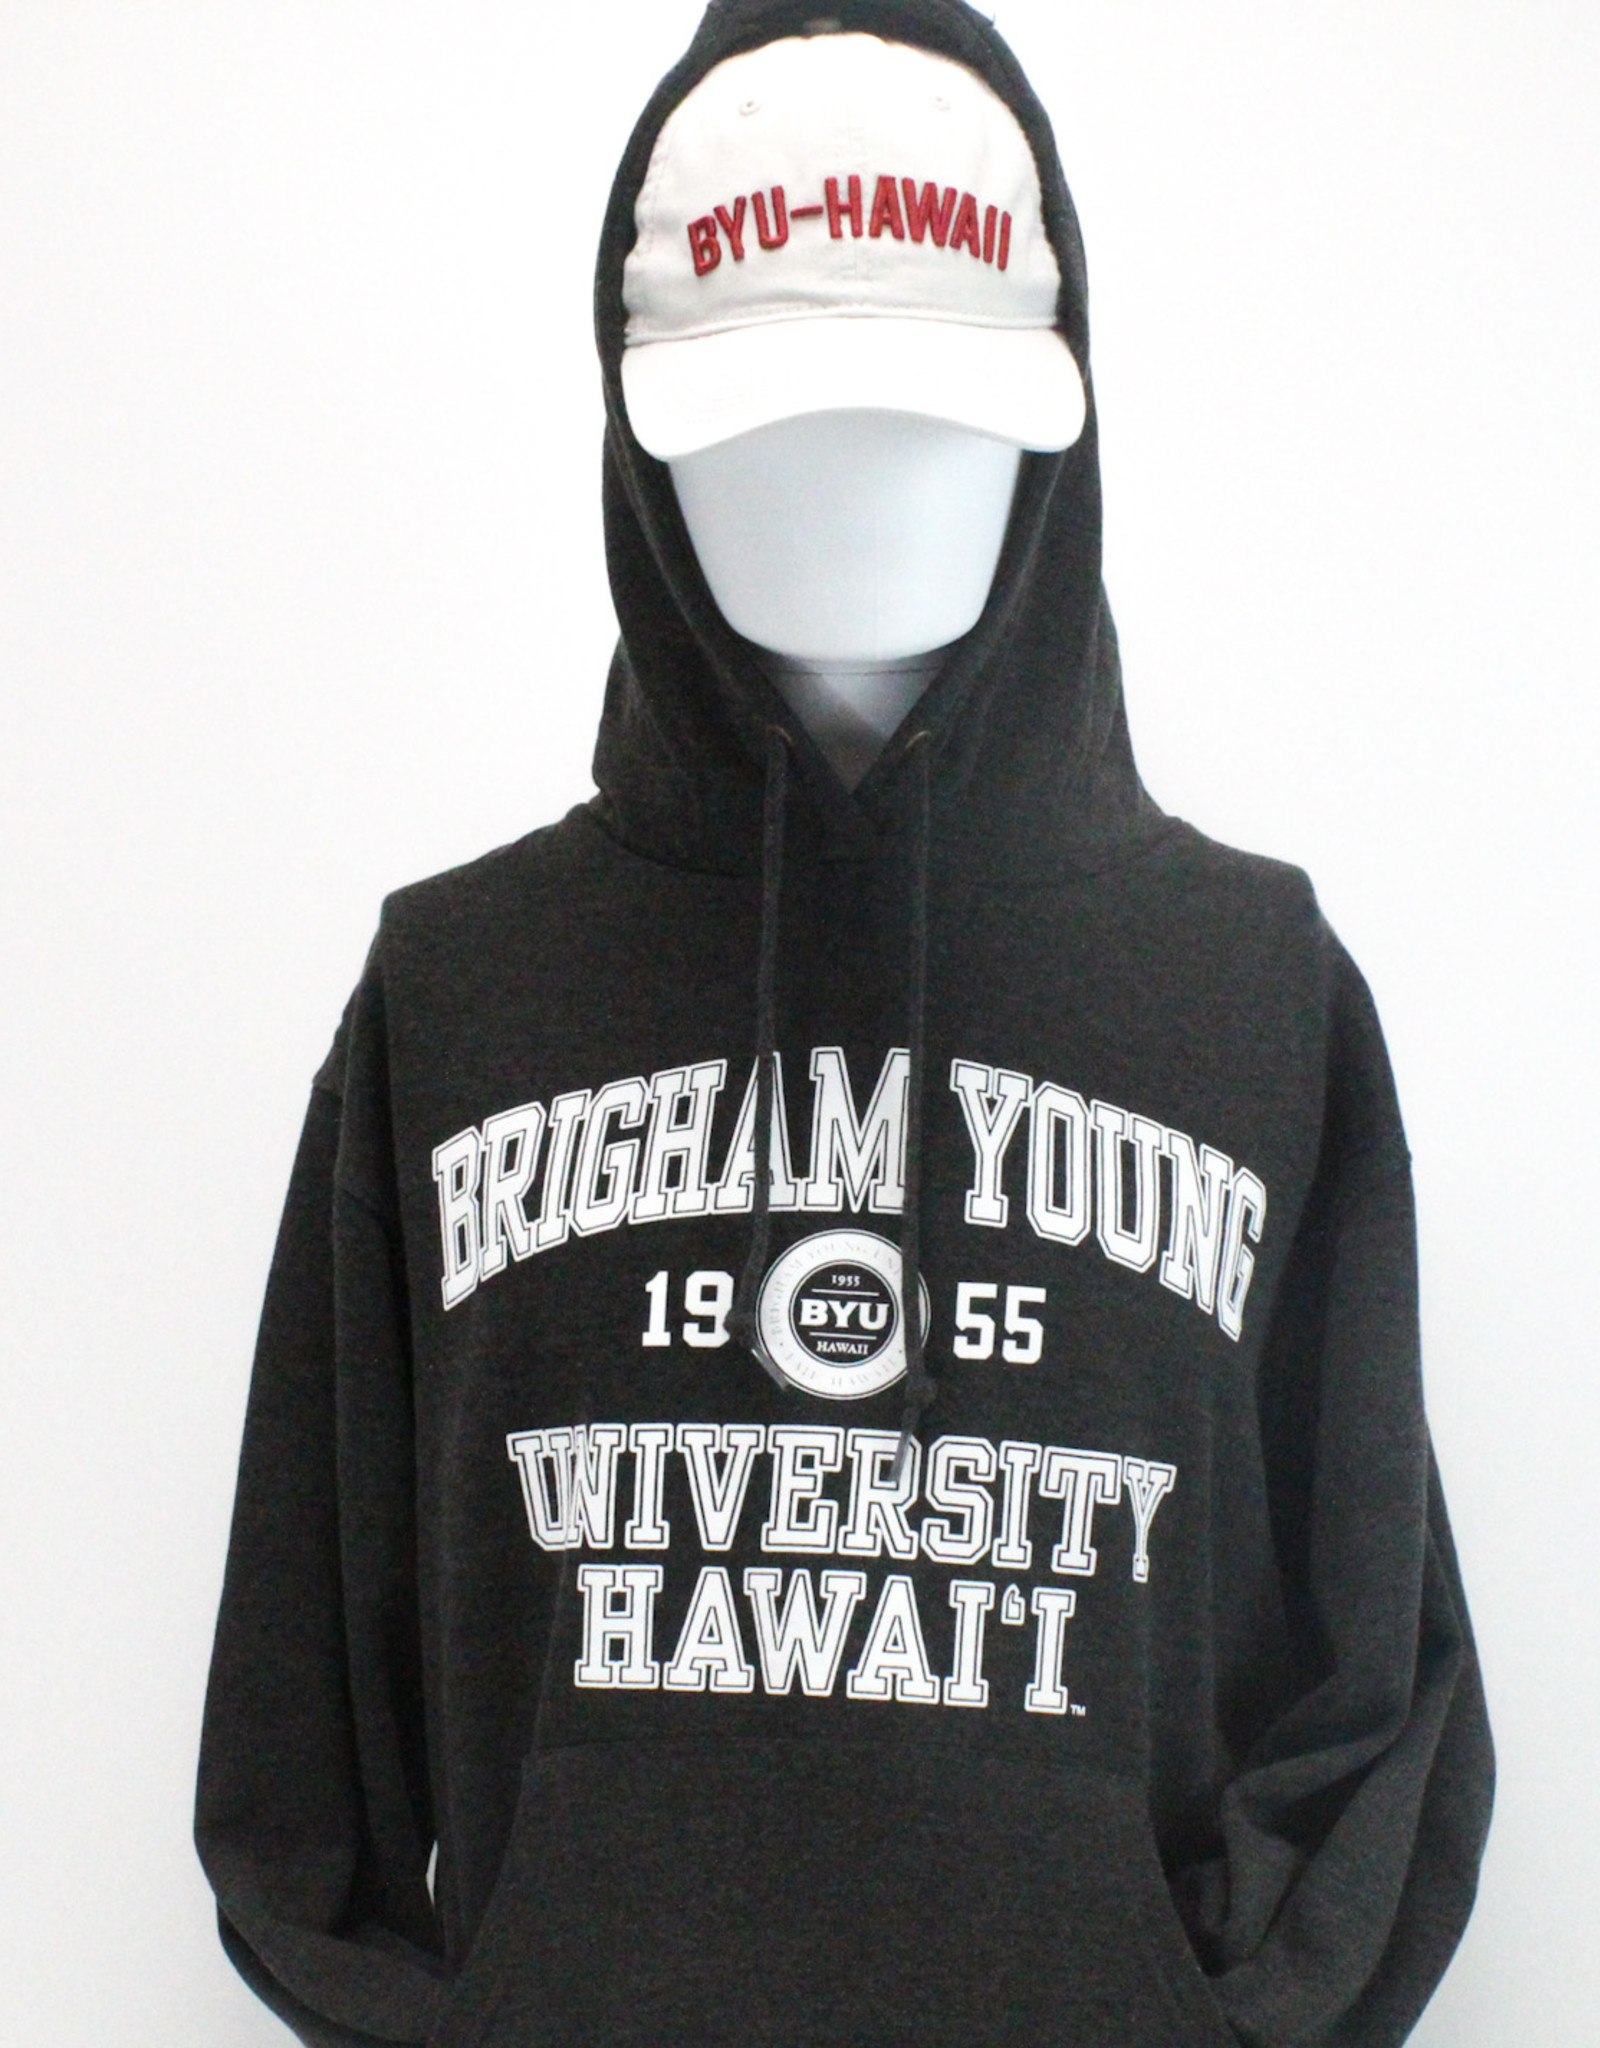 BYU-Hawaii Okina Small Seal Hoodie